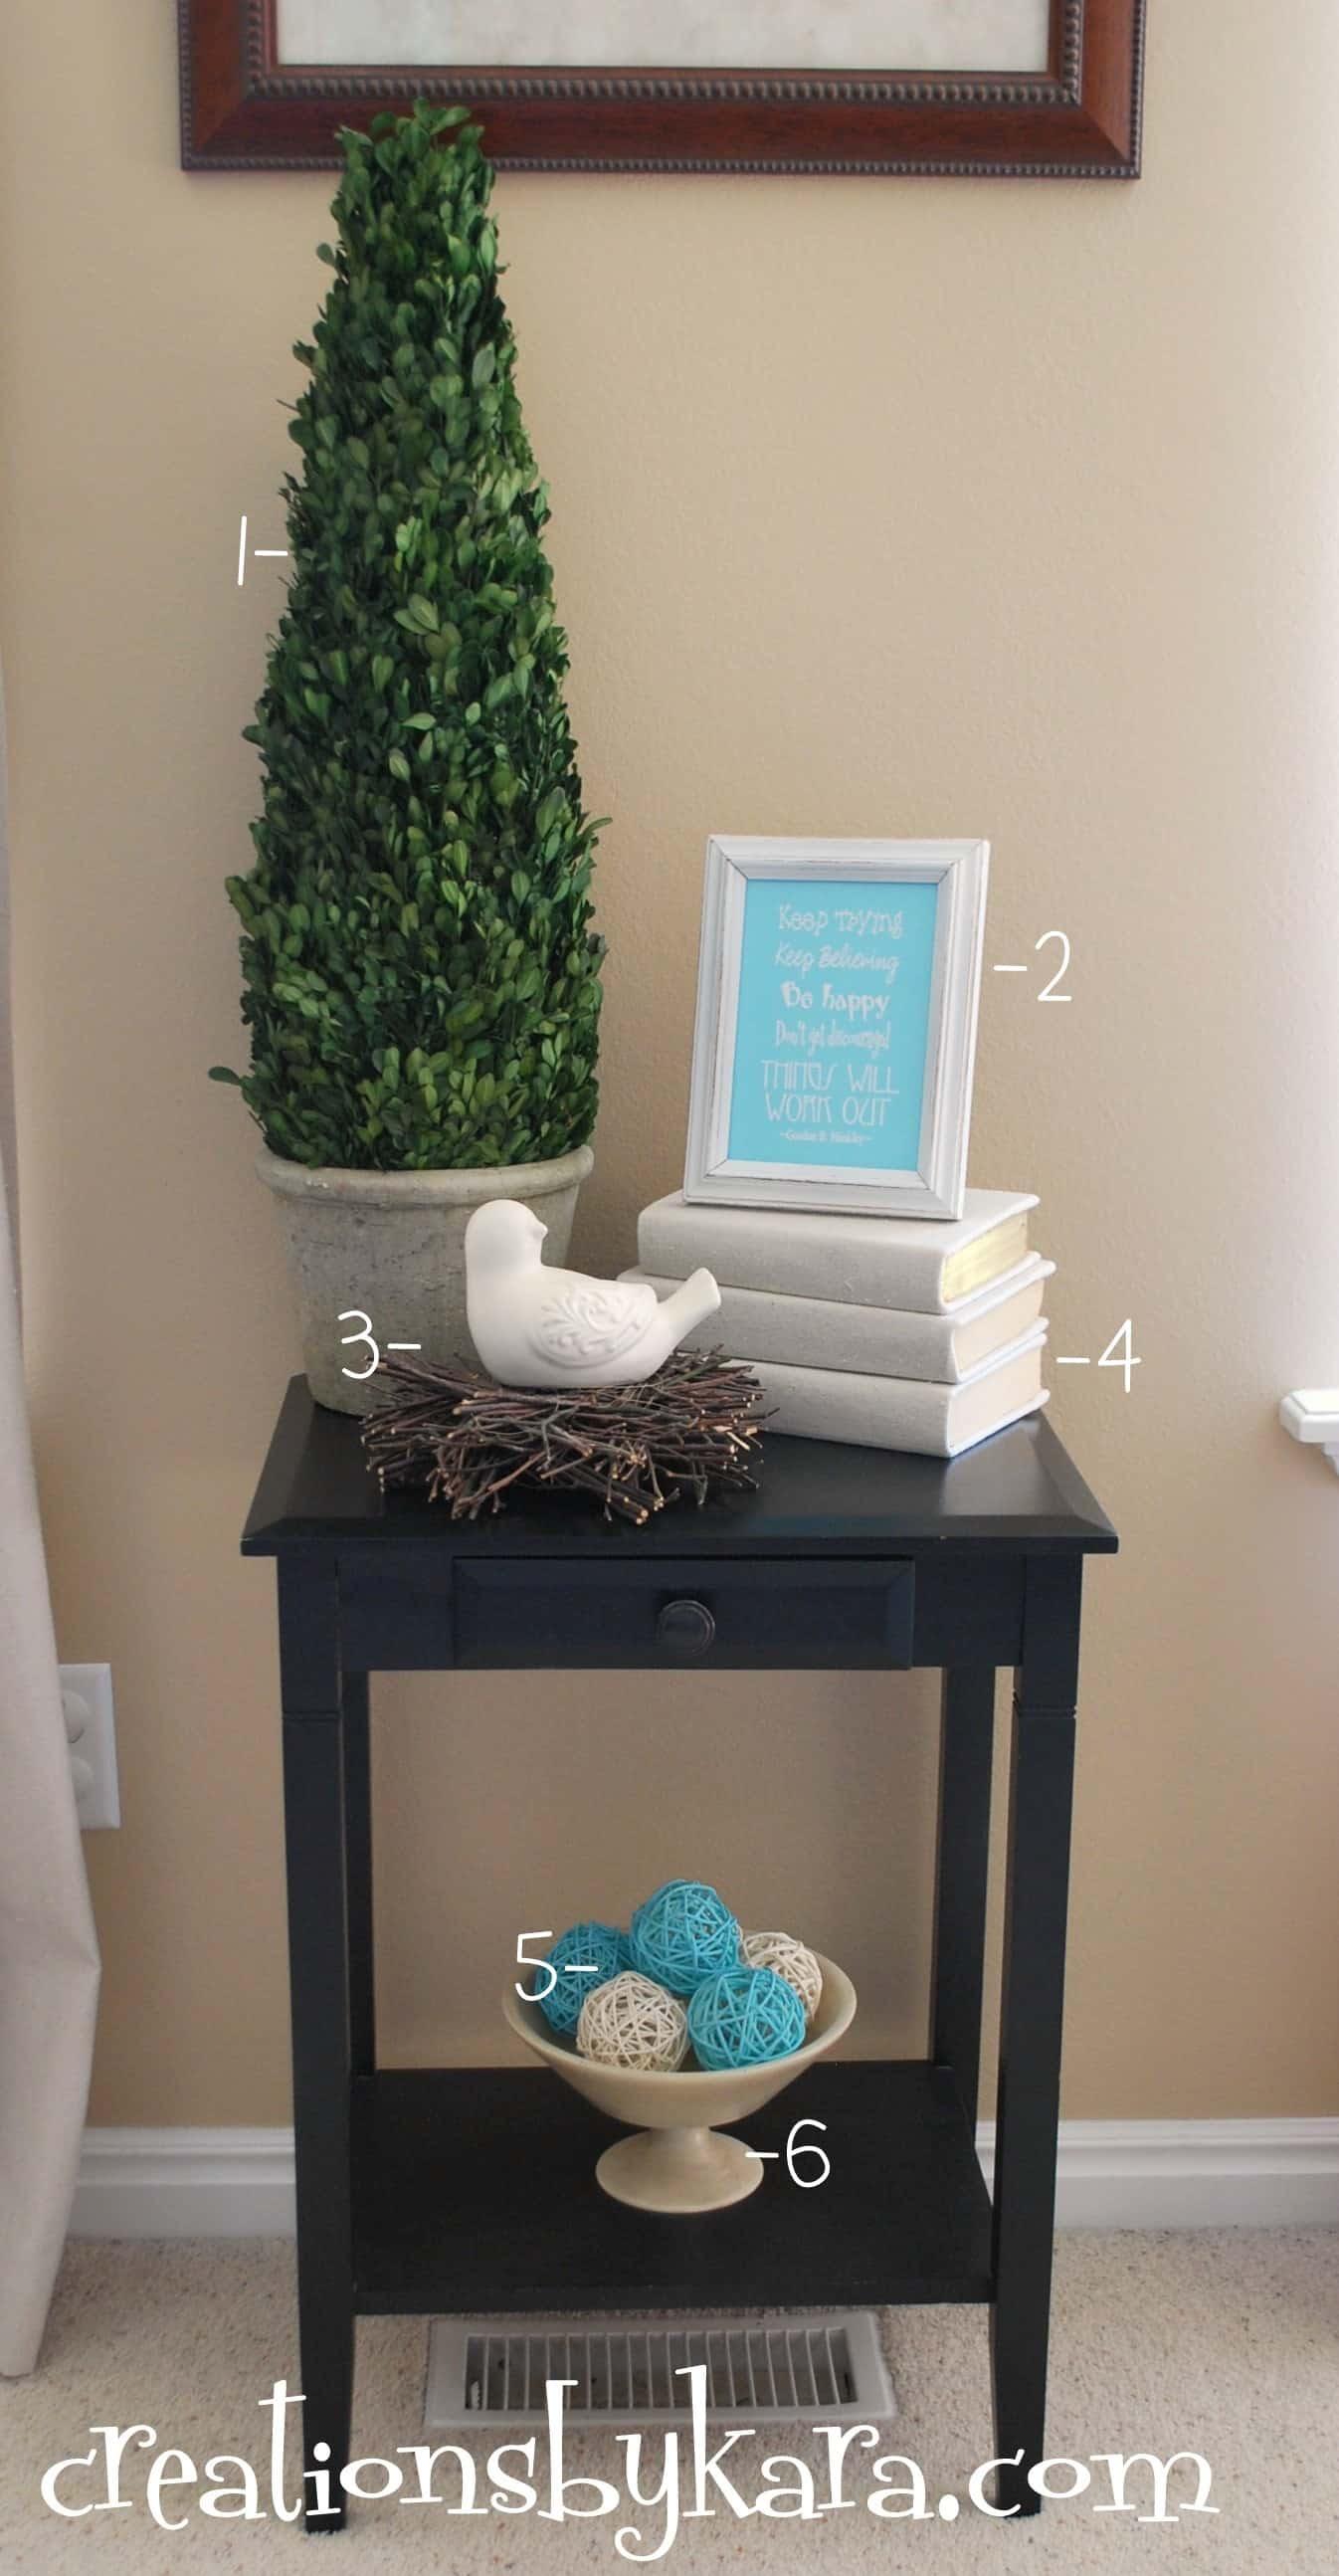 DIY Decorating- Living Room Table - Creations by Kara